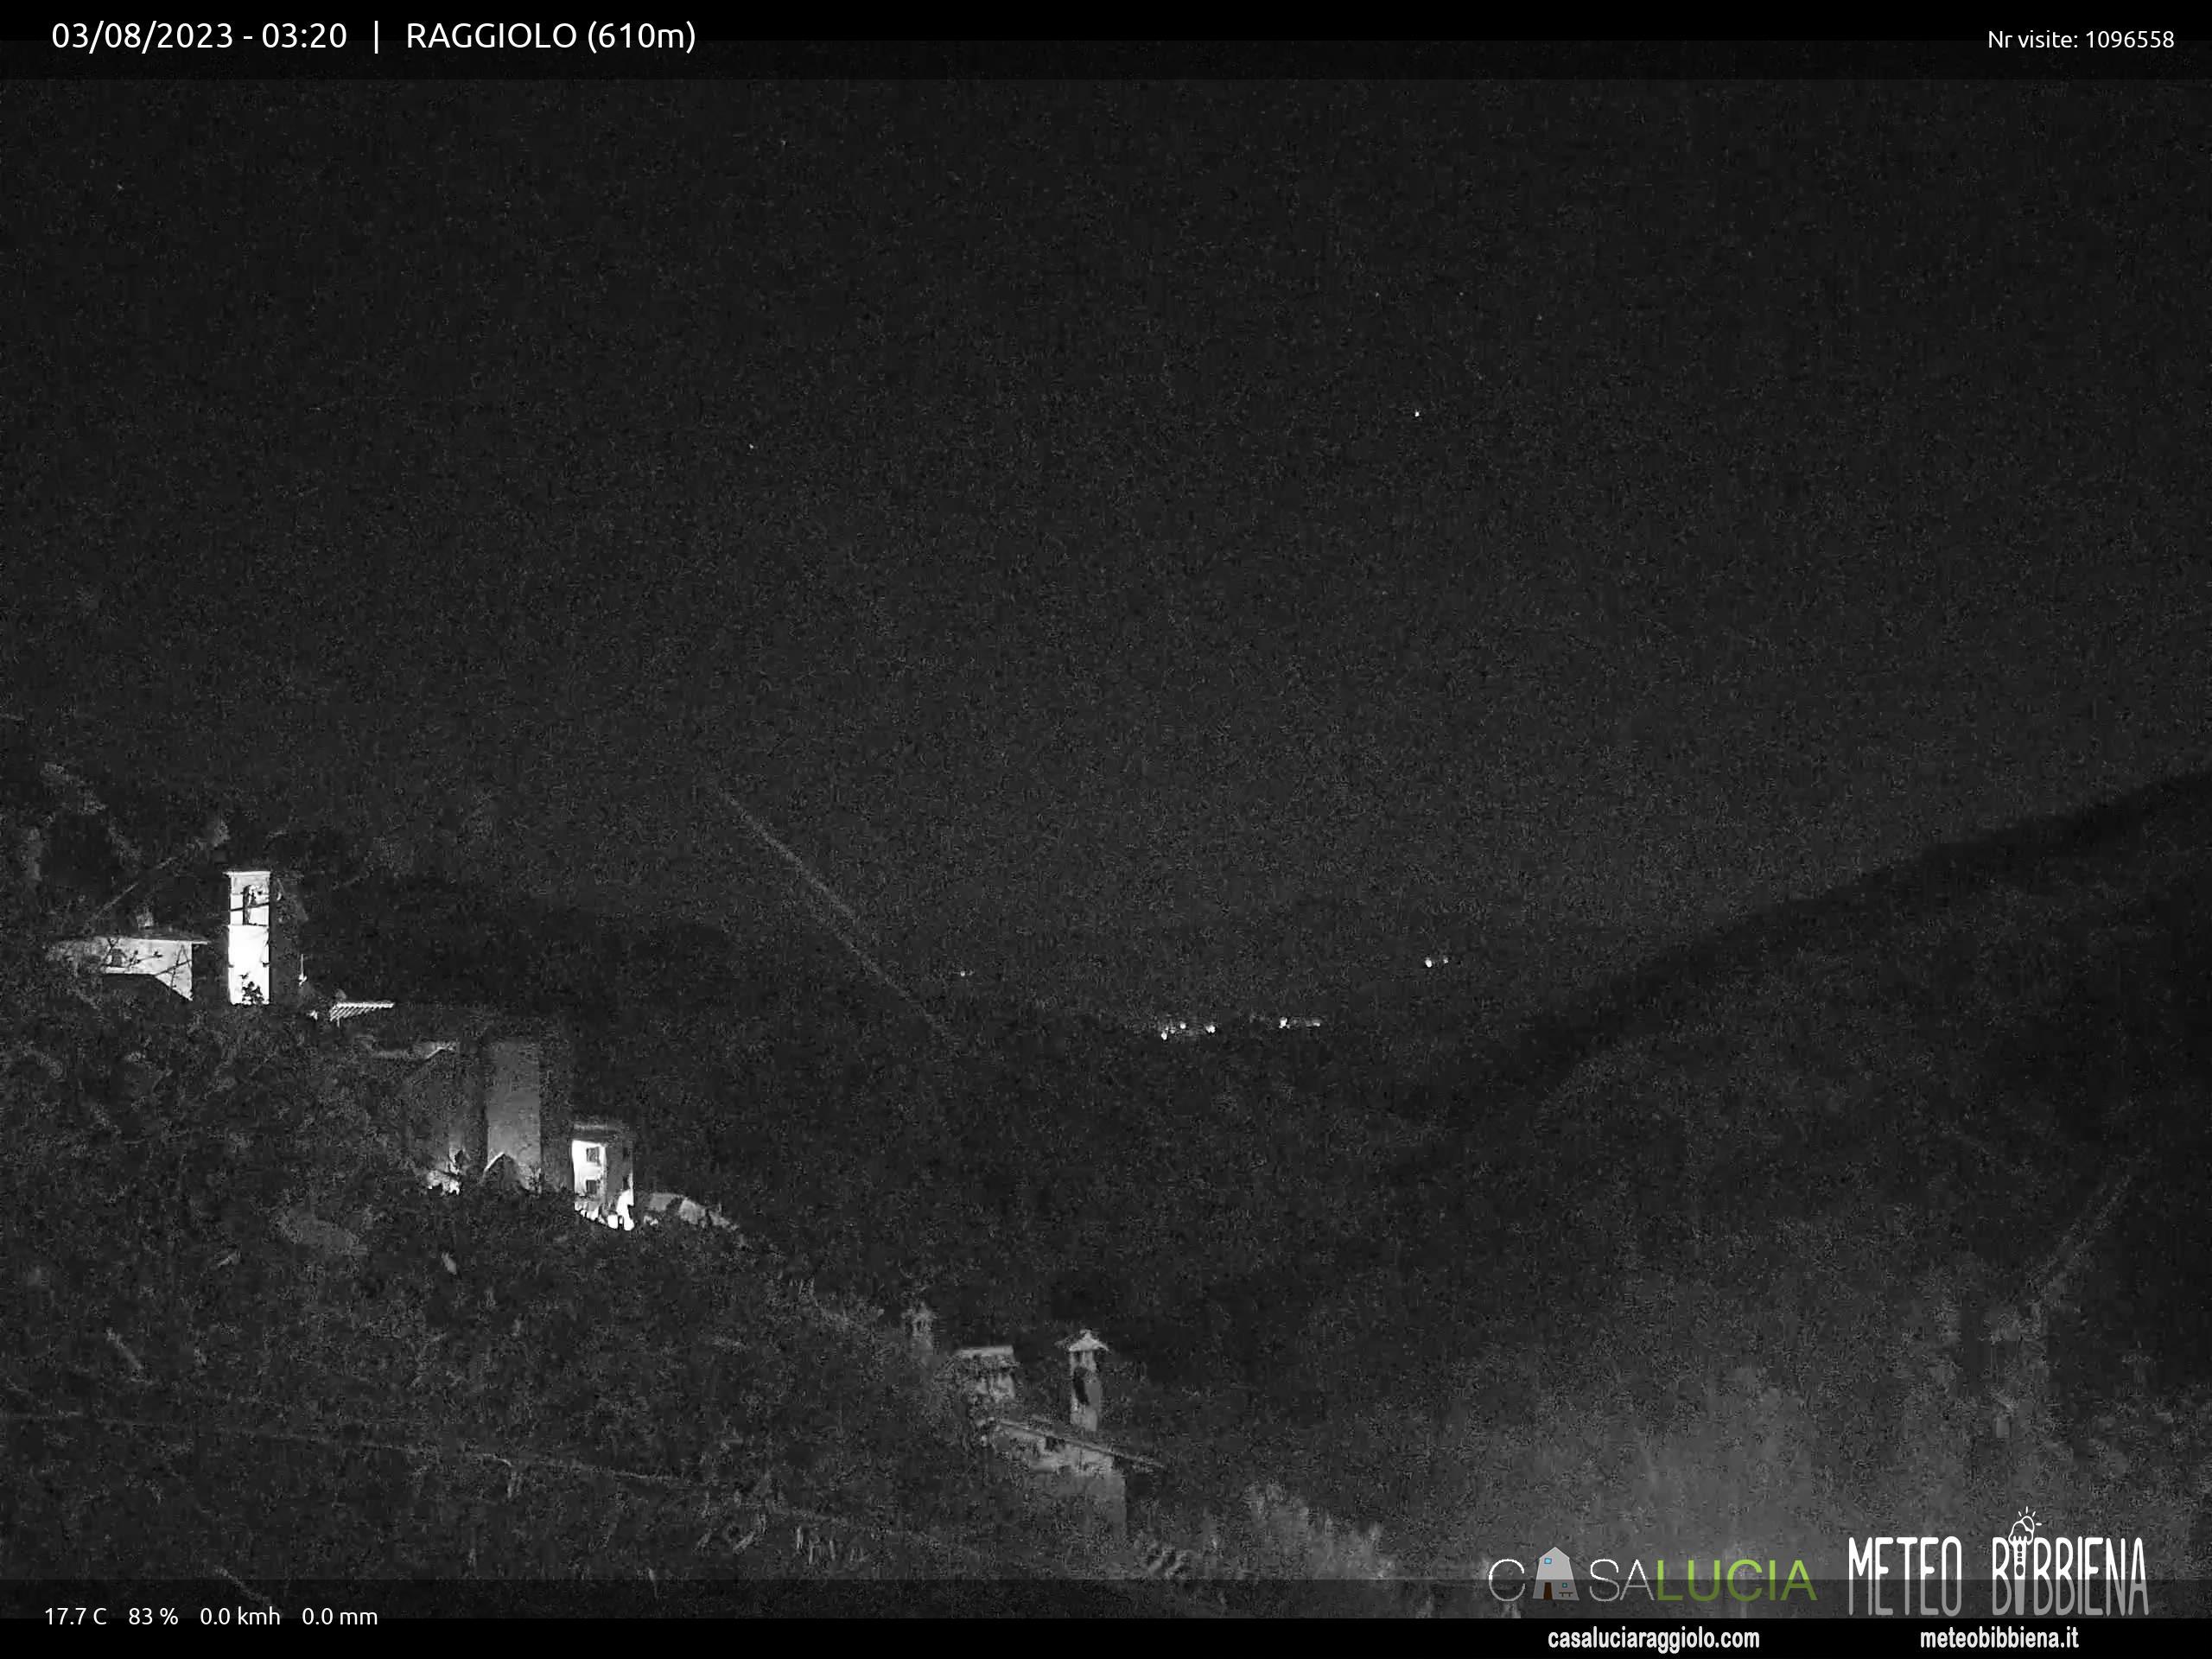 webcam Raggiolo, webcam provincia di Arezzo, webcam Toscana